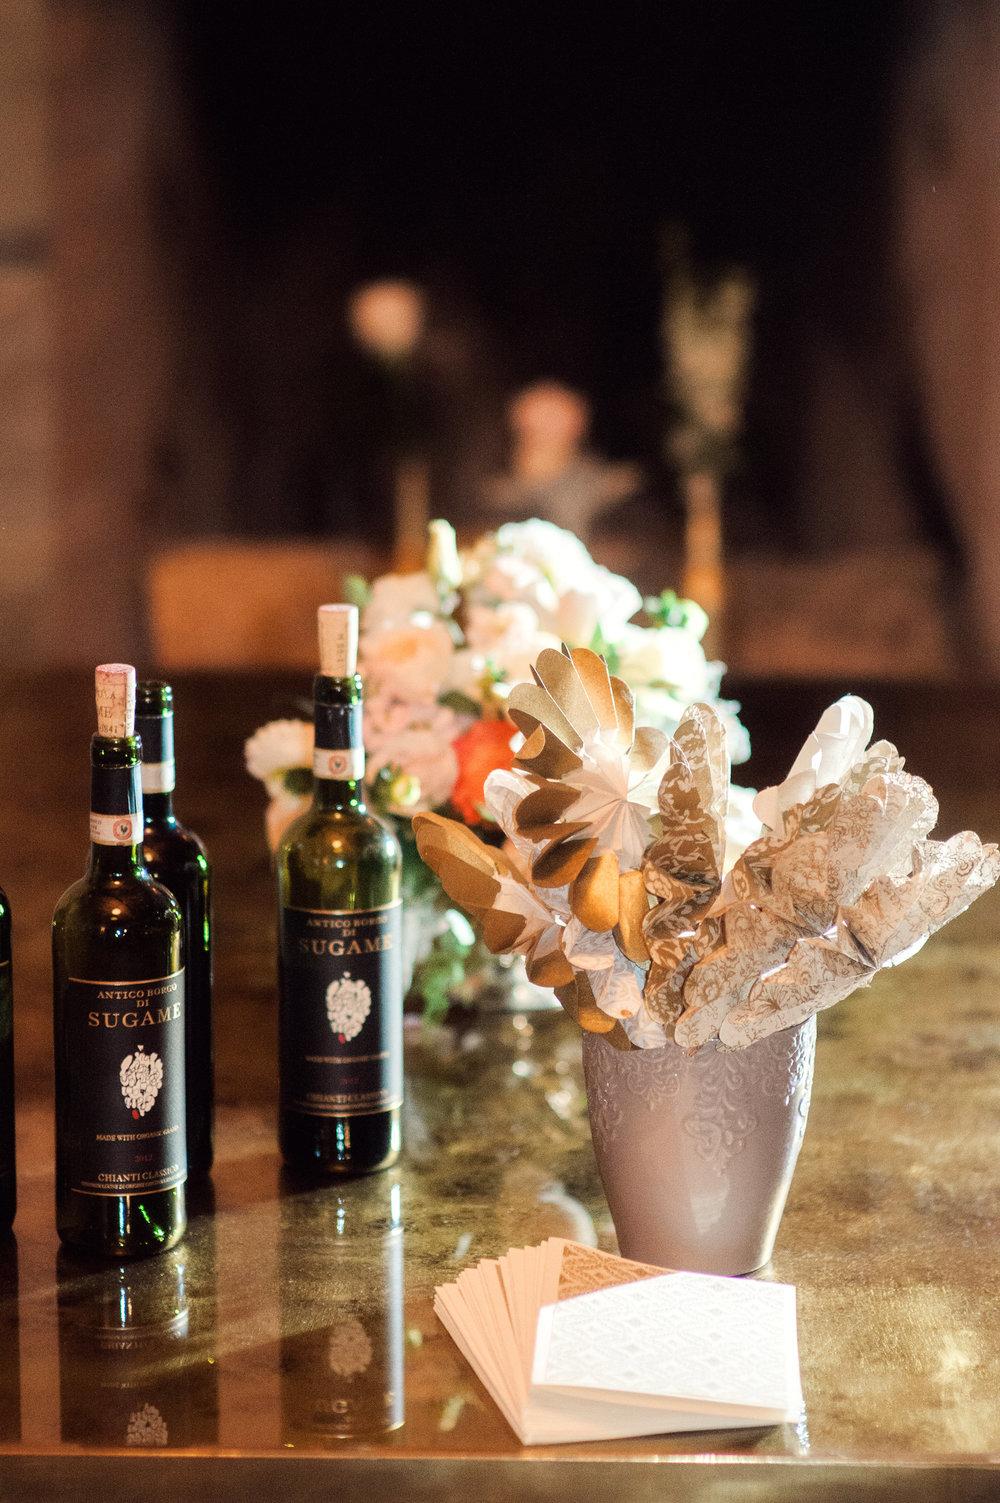 santabarbarawedding.com | Wisteria Lane Flroal Design Studio | Bride and Groom | Garden Roses | Tea Roses | Spray Roses | Bar Station